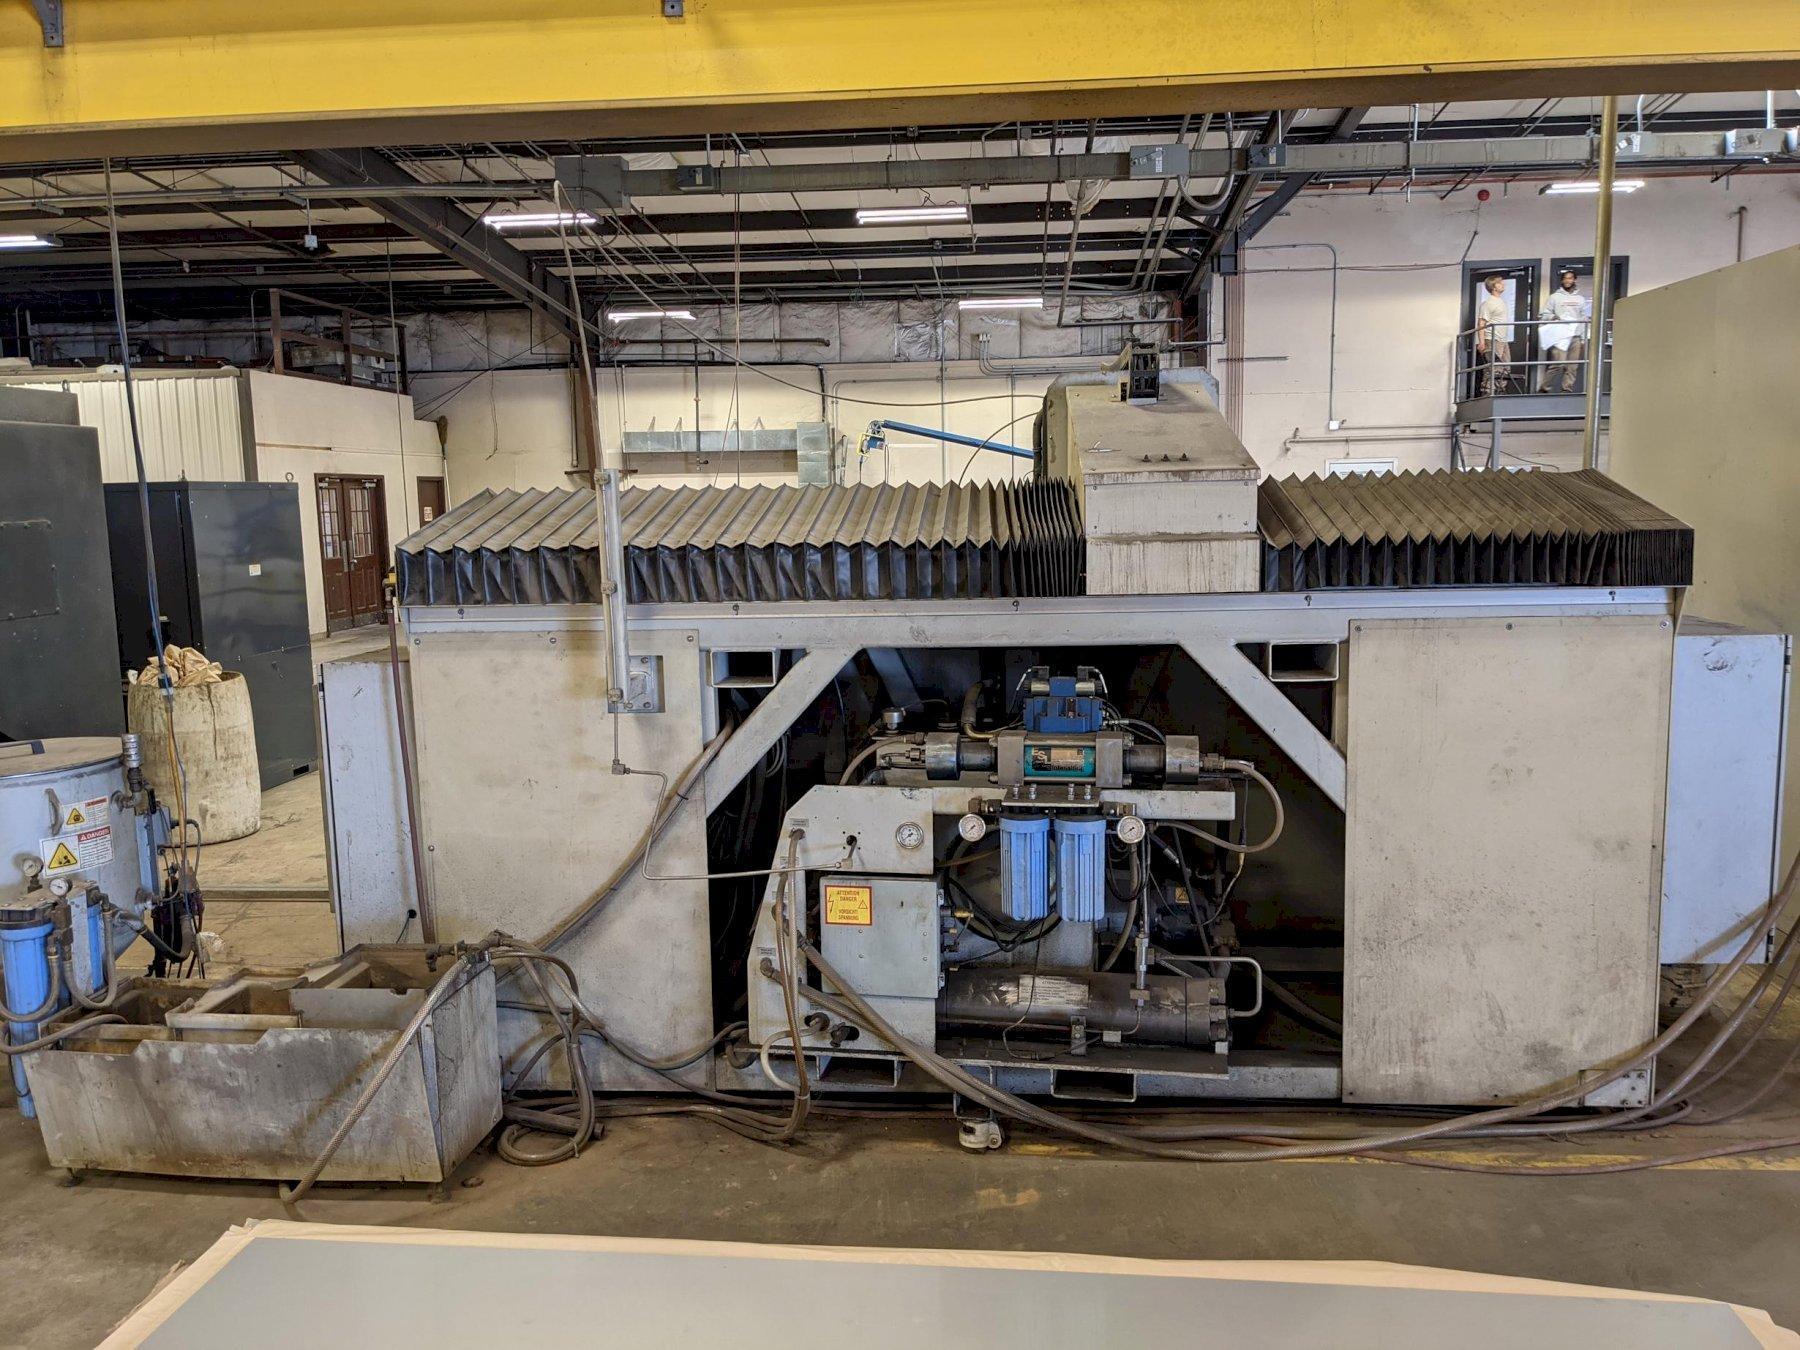 2006 Flow IFB 4800, 4x8, 60,000 PSI Waterjet Cutting Machine